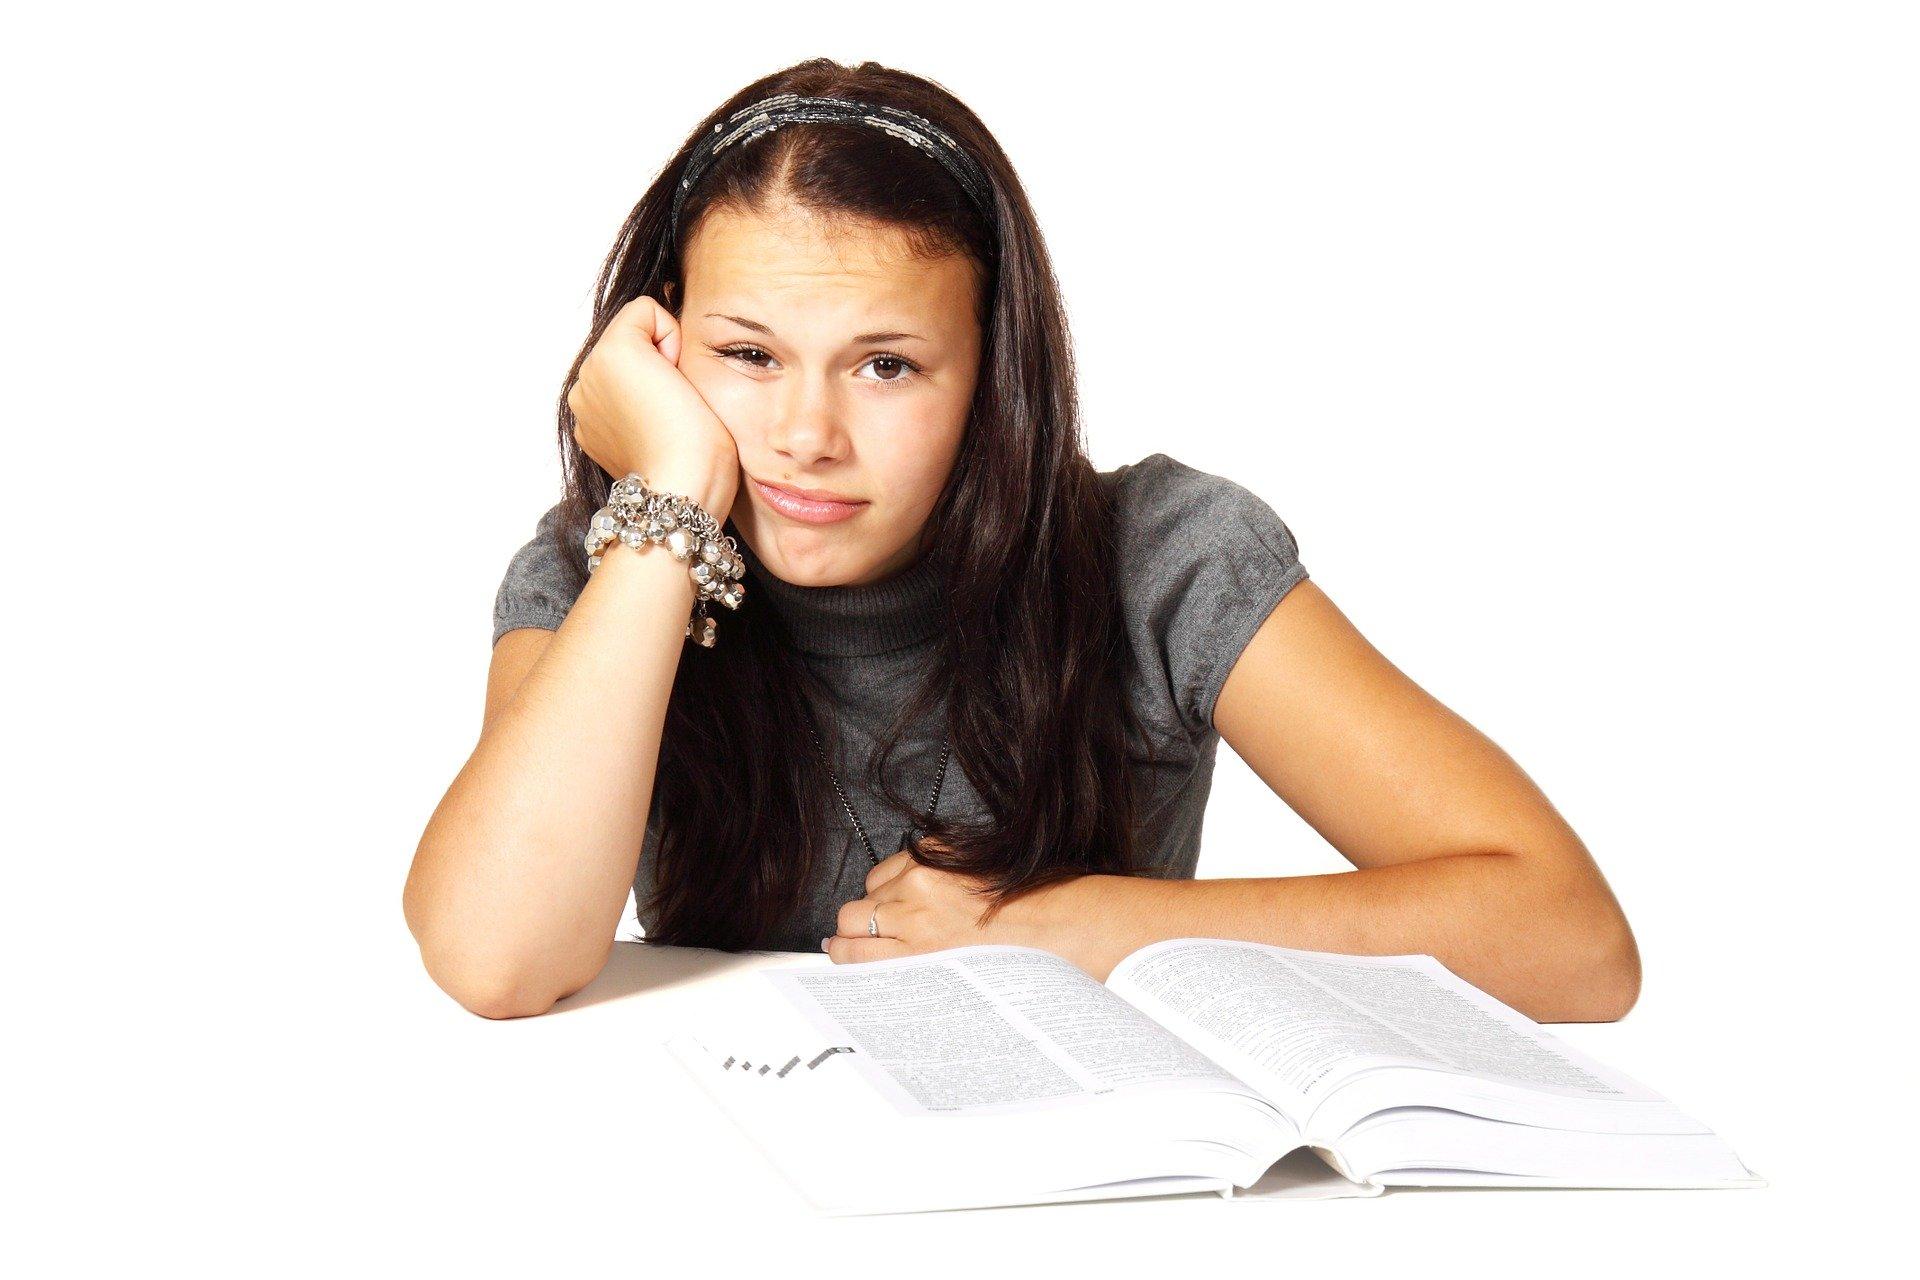 Homeschooling, Schule Zuhause, Entspannung, Ausgleich, Yoga